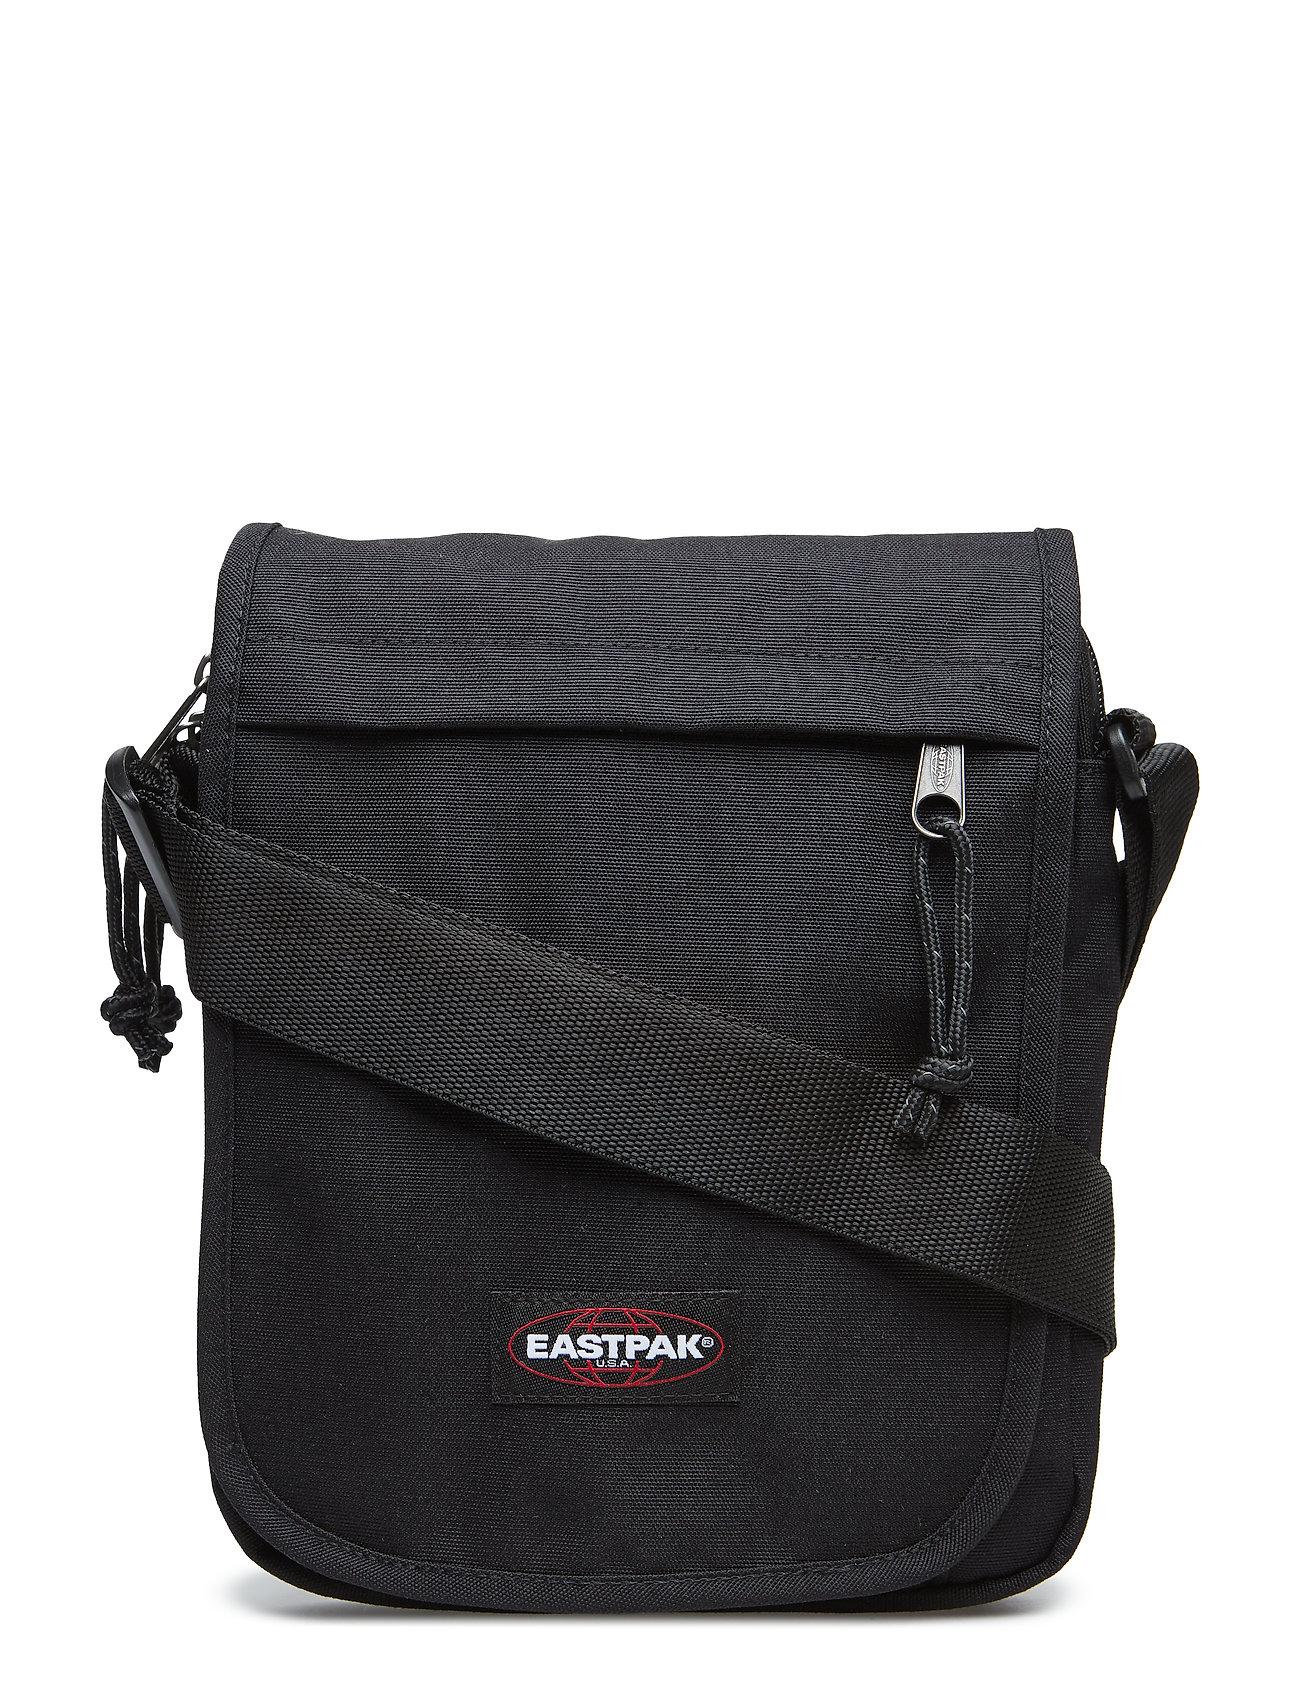 Eastpak FLEX - BLACK